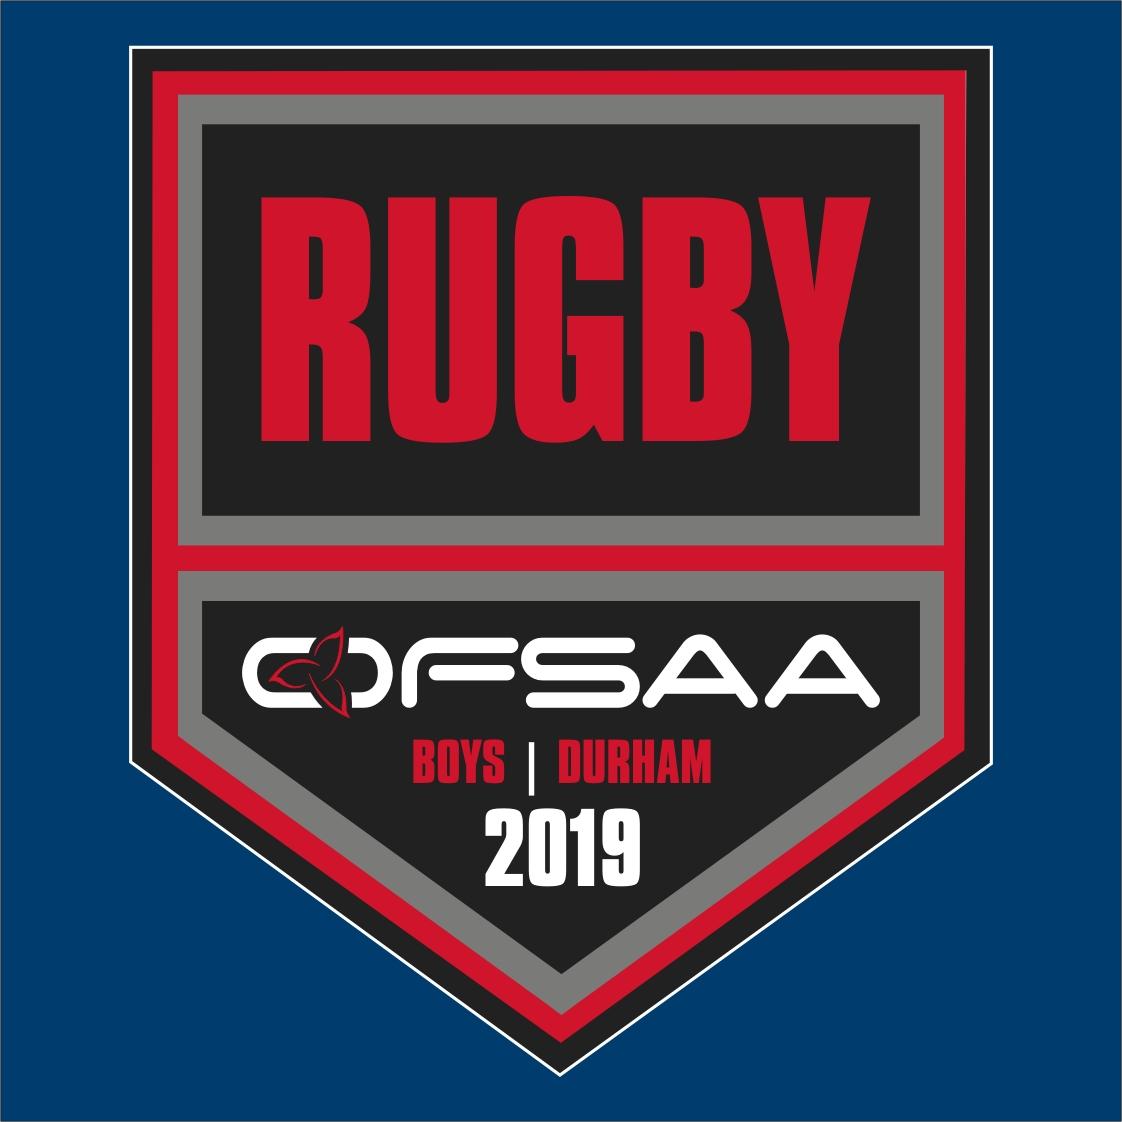 2019 Boys Rugby logo navy.jpg